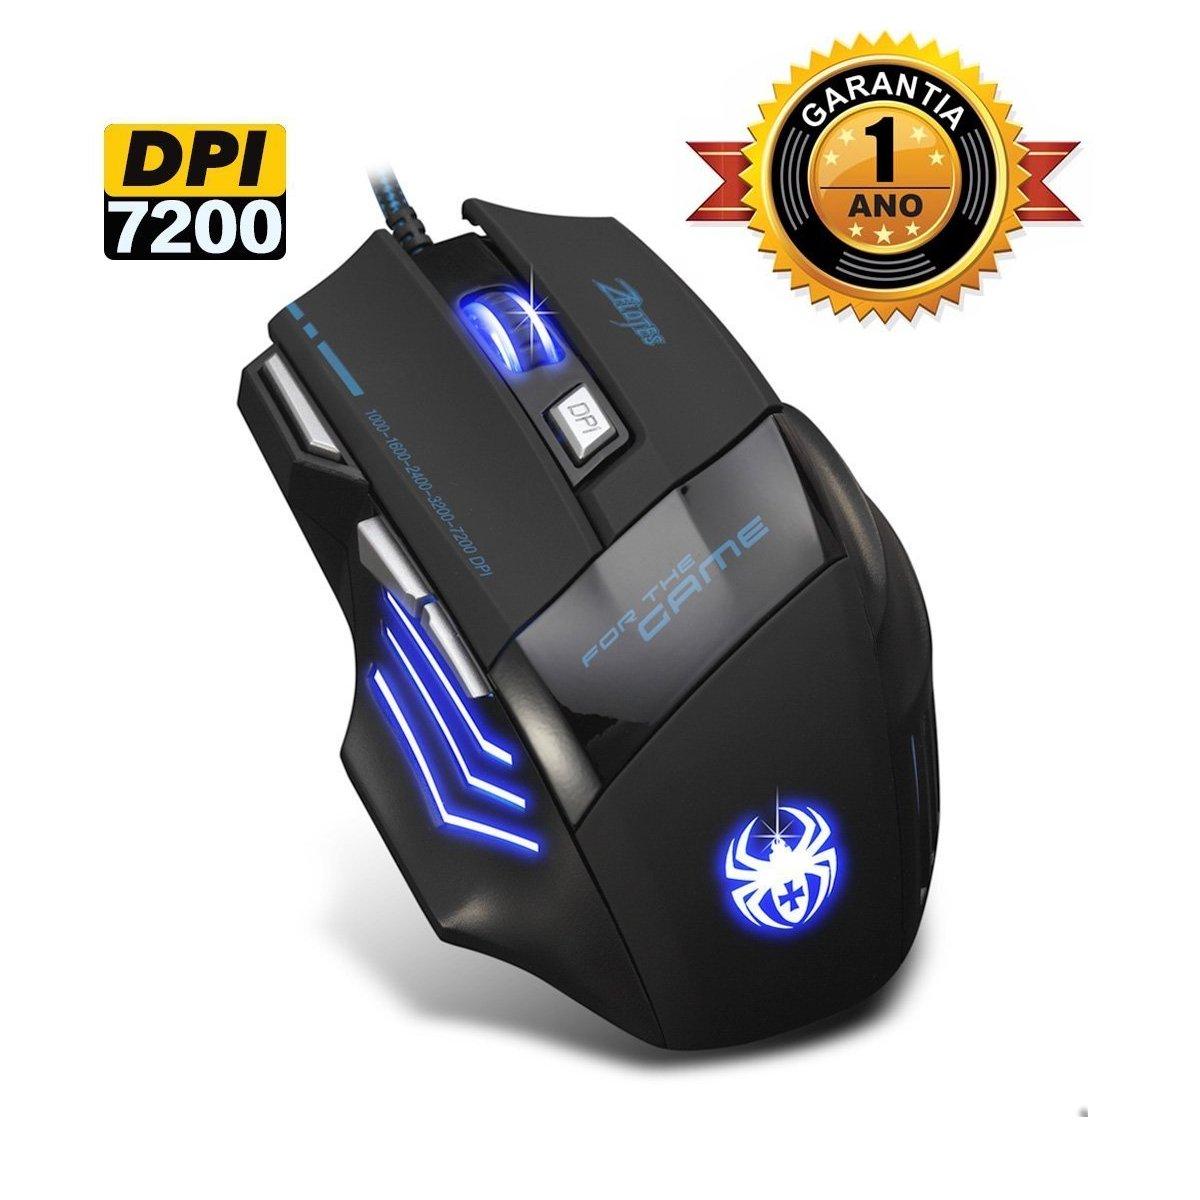 Nueva versión Ratón Mouse para PC Gaming con DPI CorVik ZELOTES T